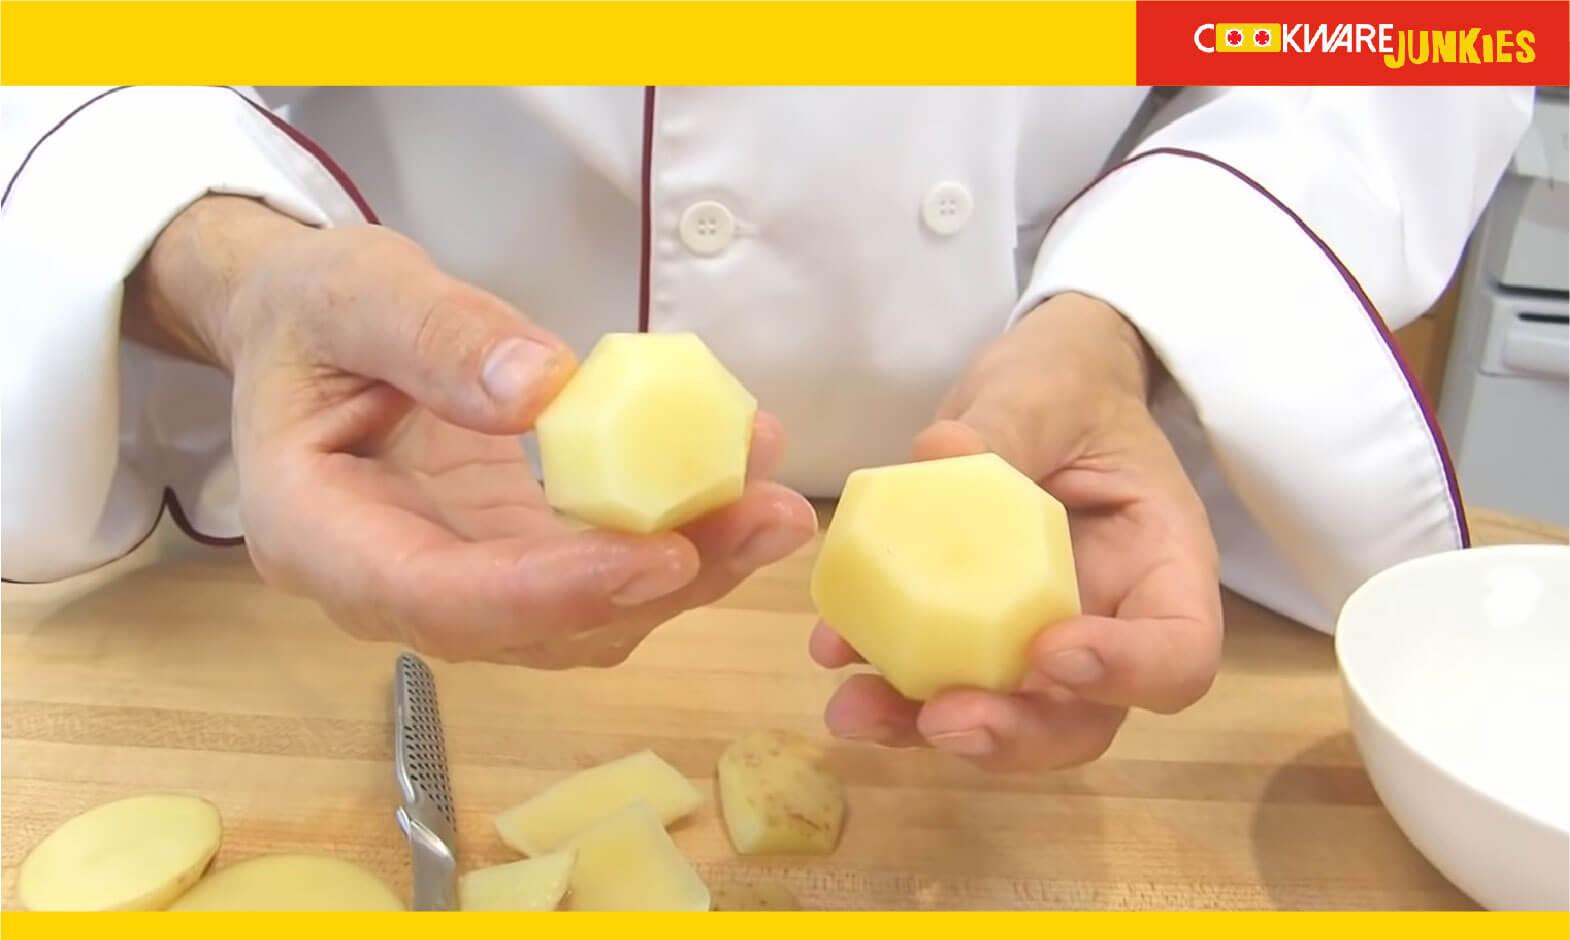 The Tourner cut potato in man hands